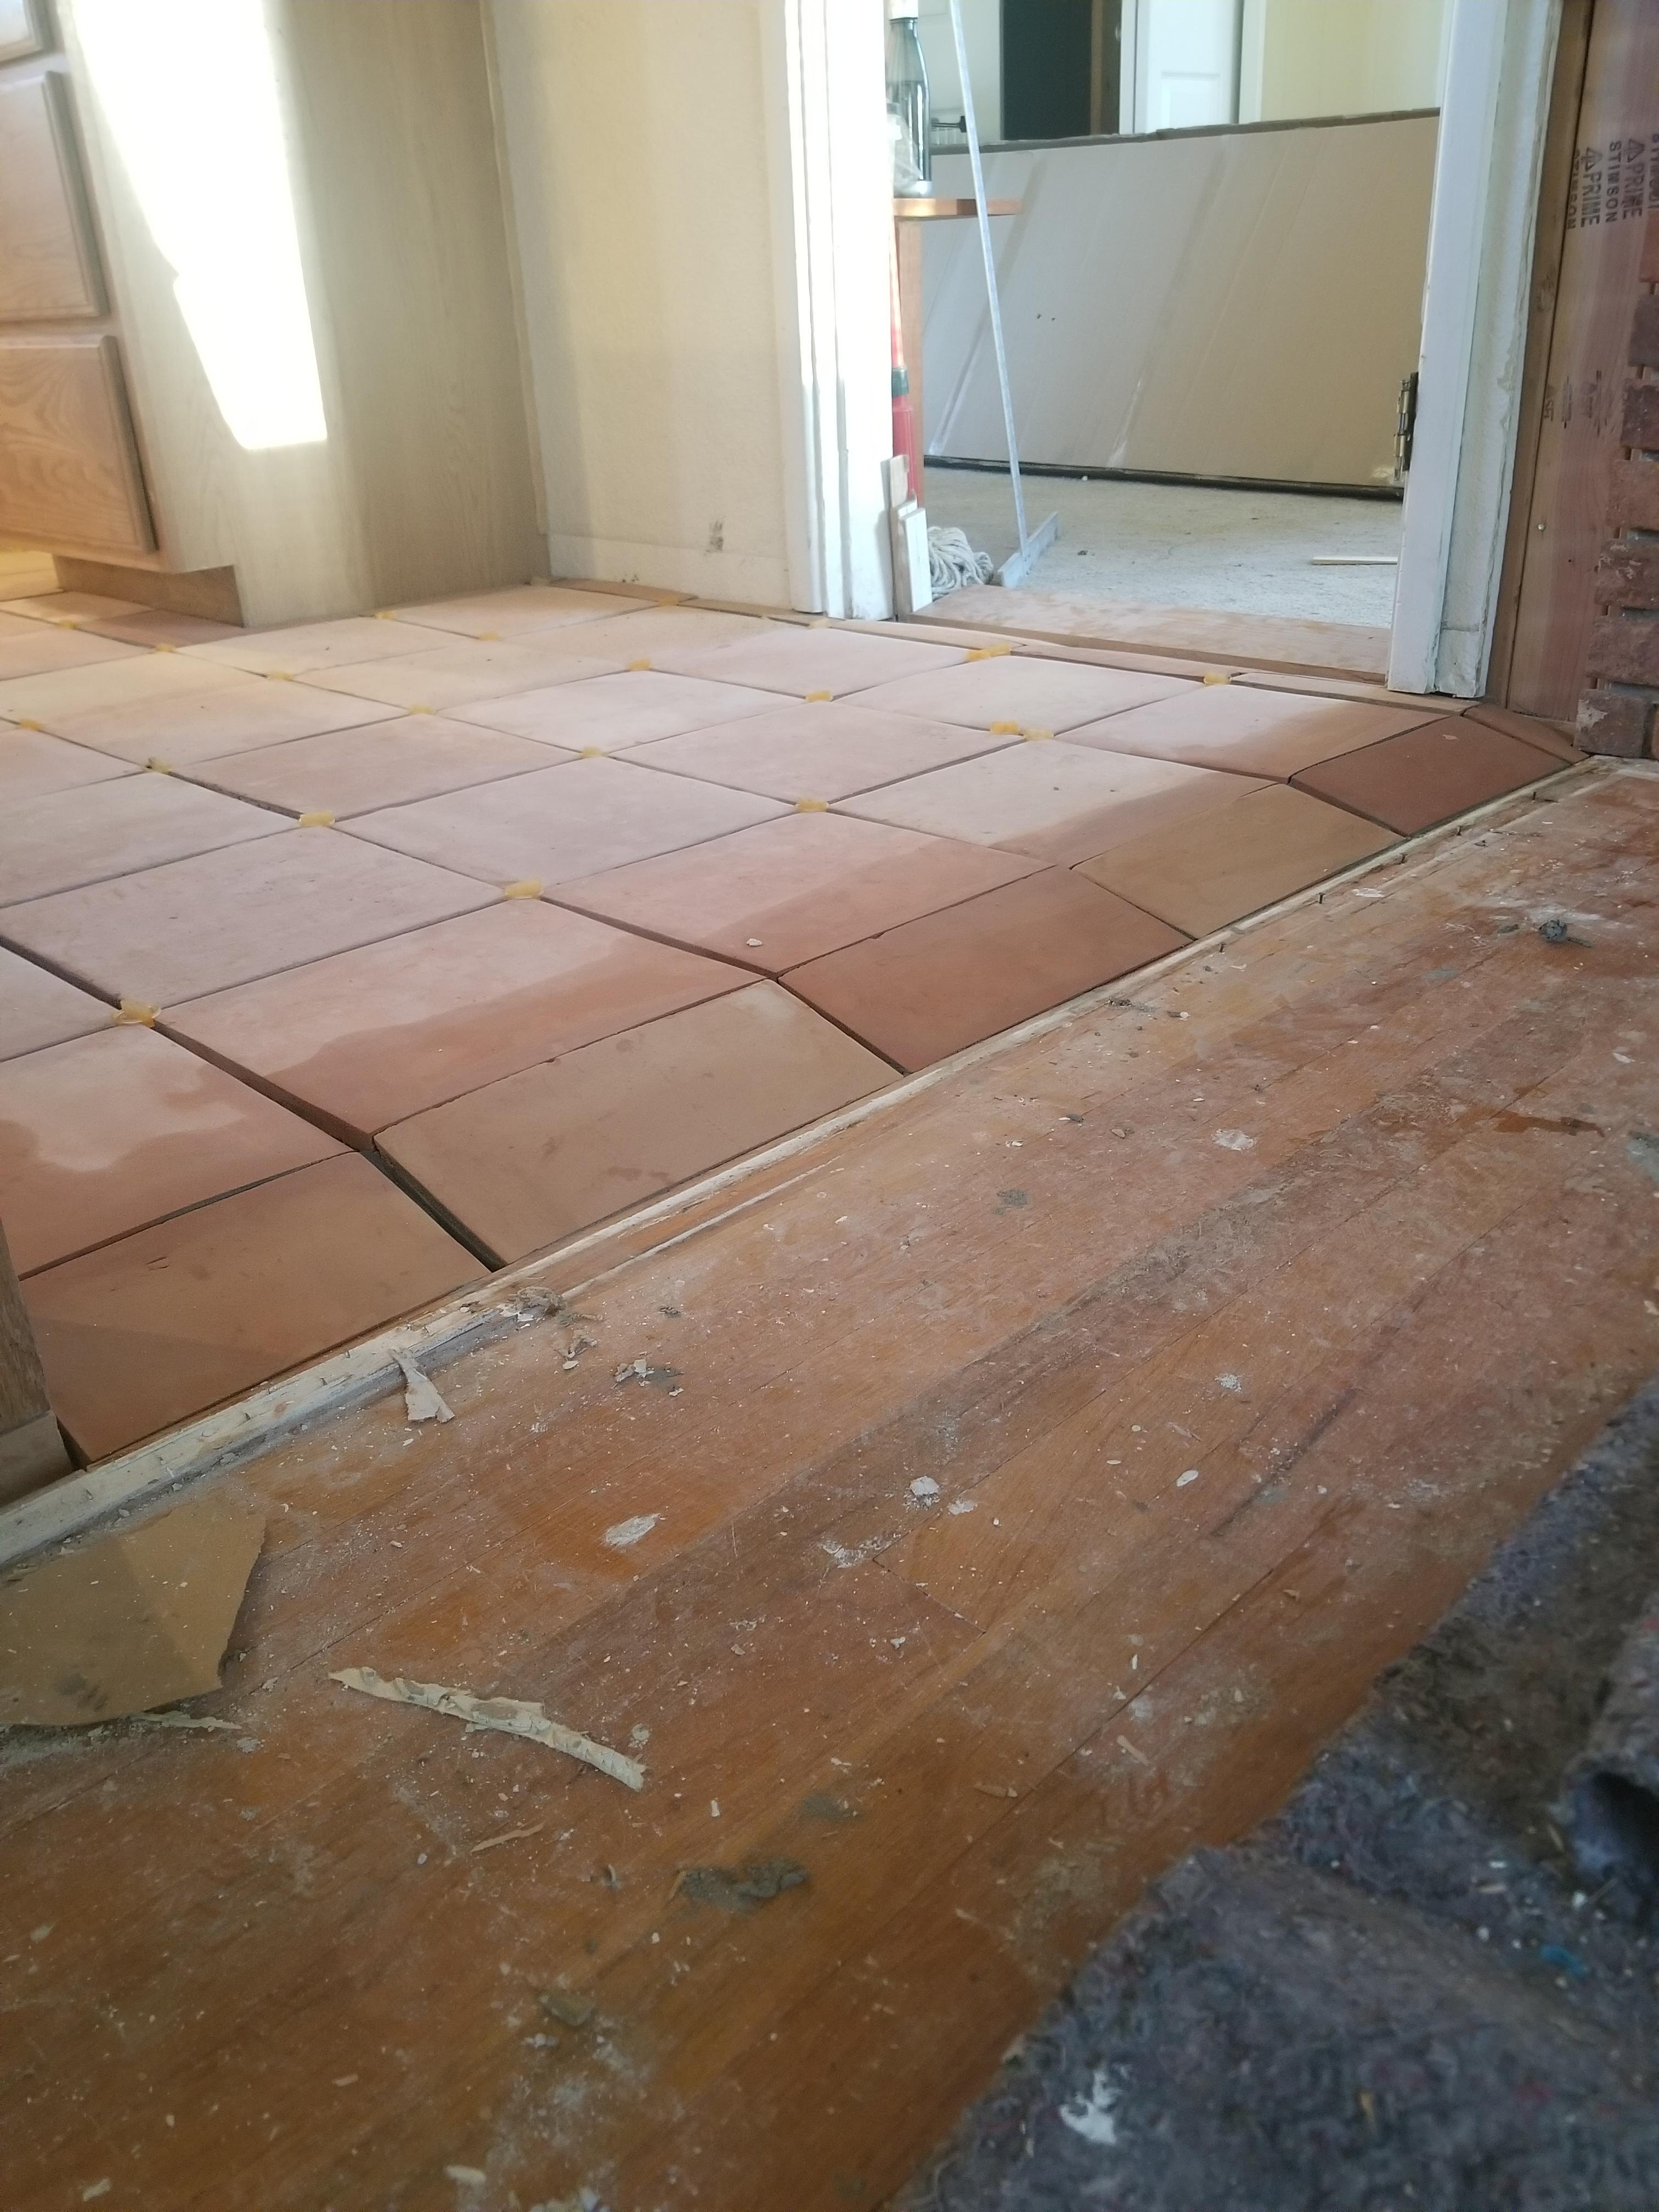 saltillo tile would look higher